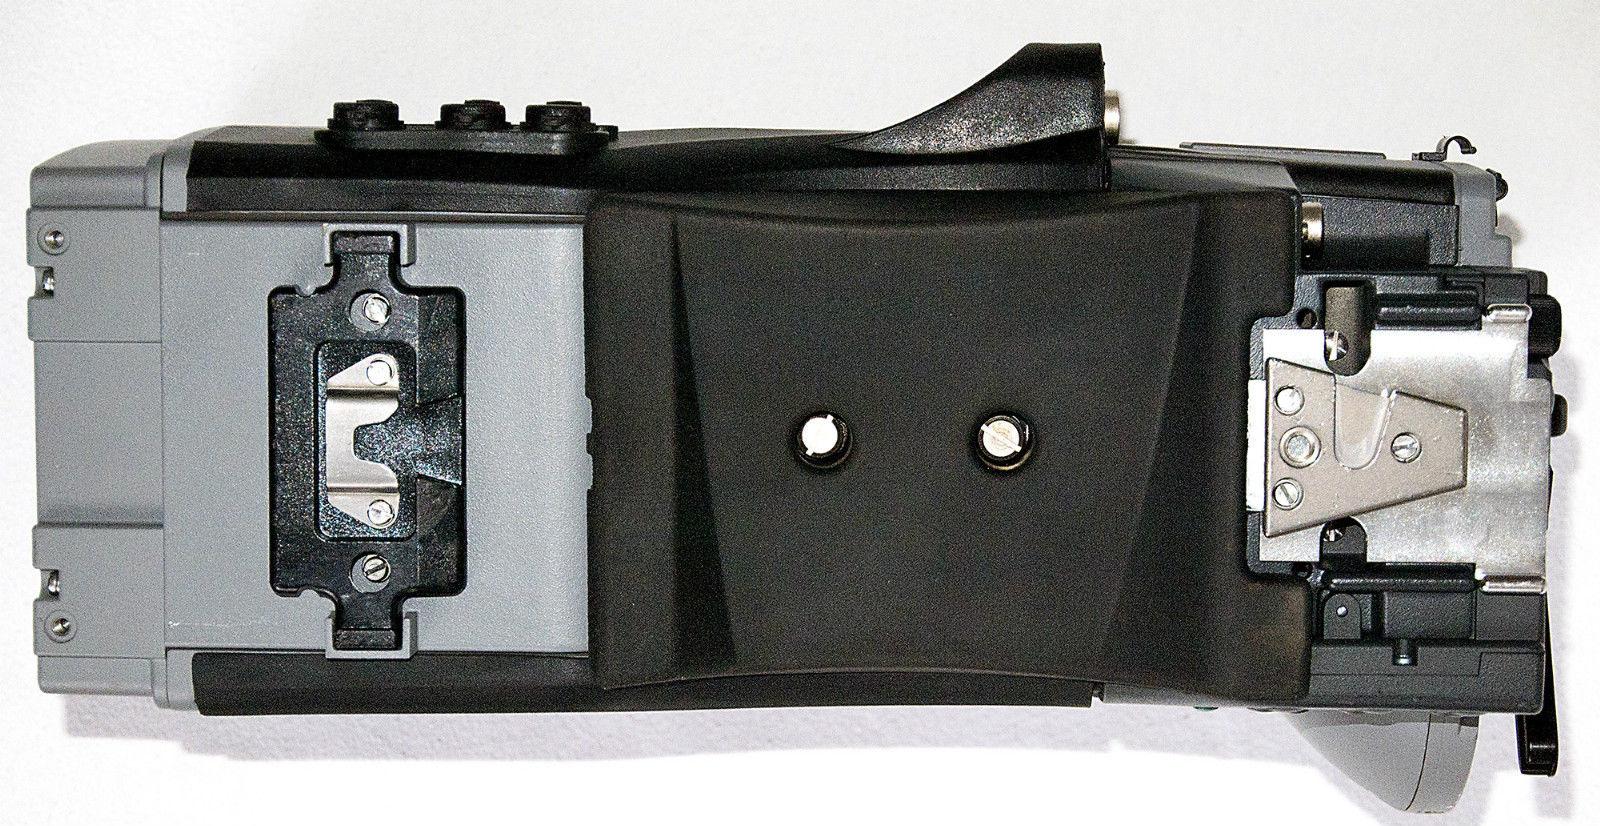 PS25 - 6